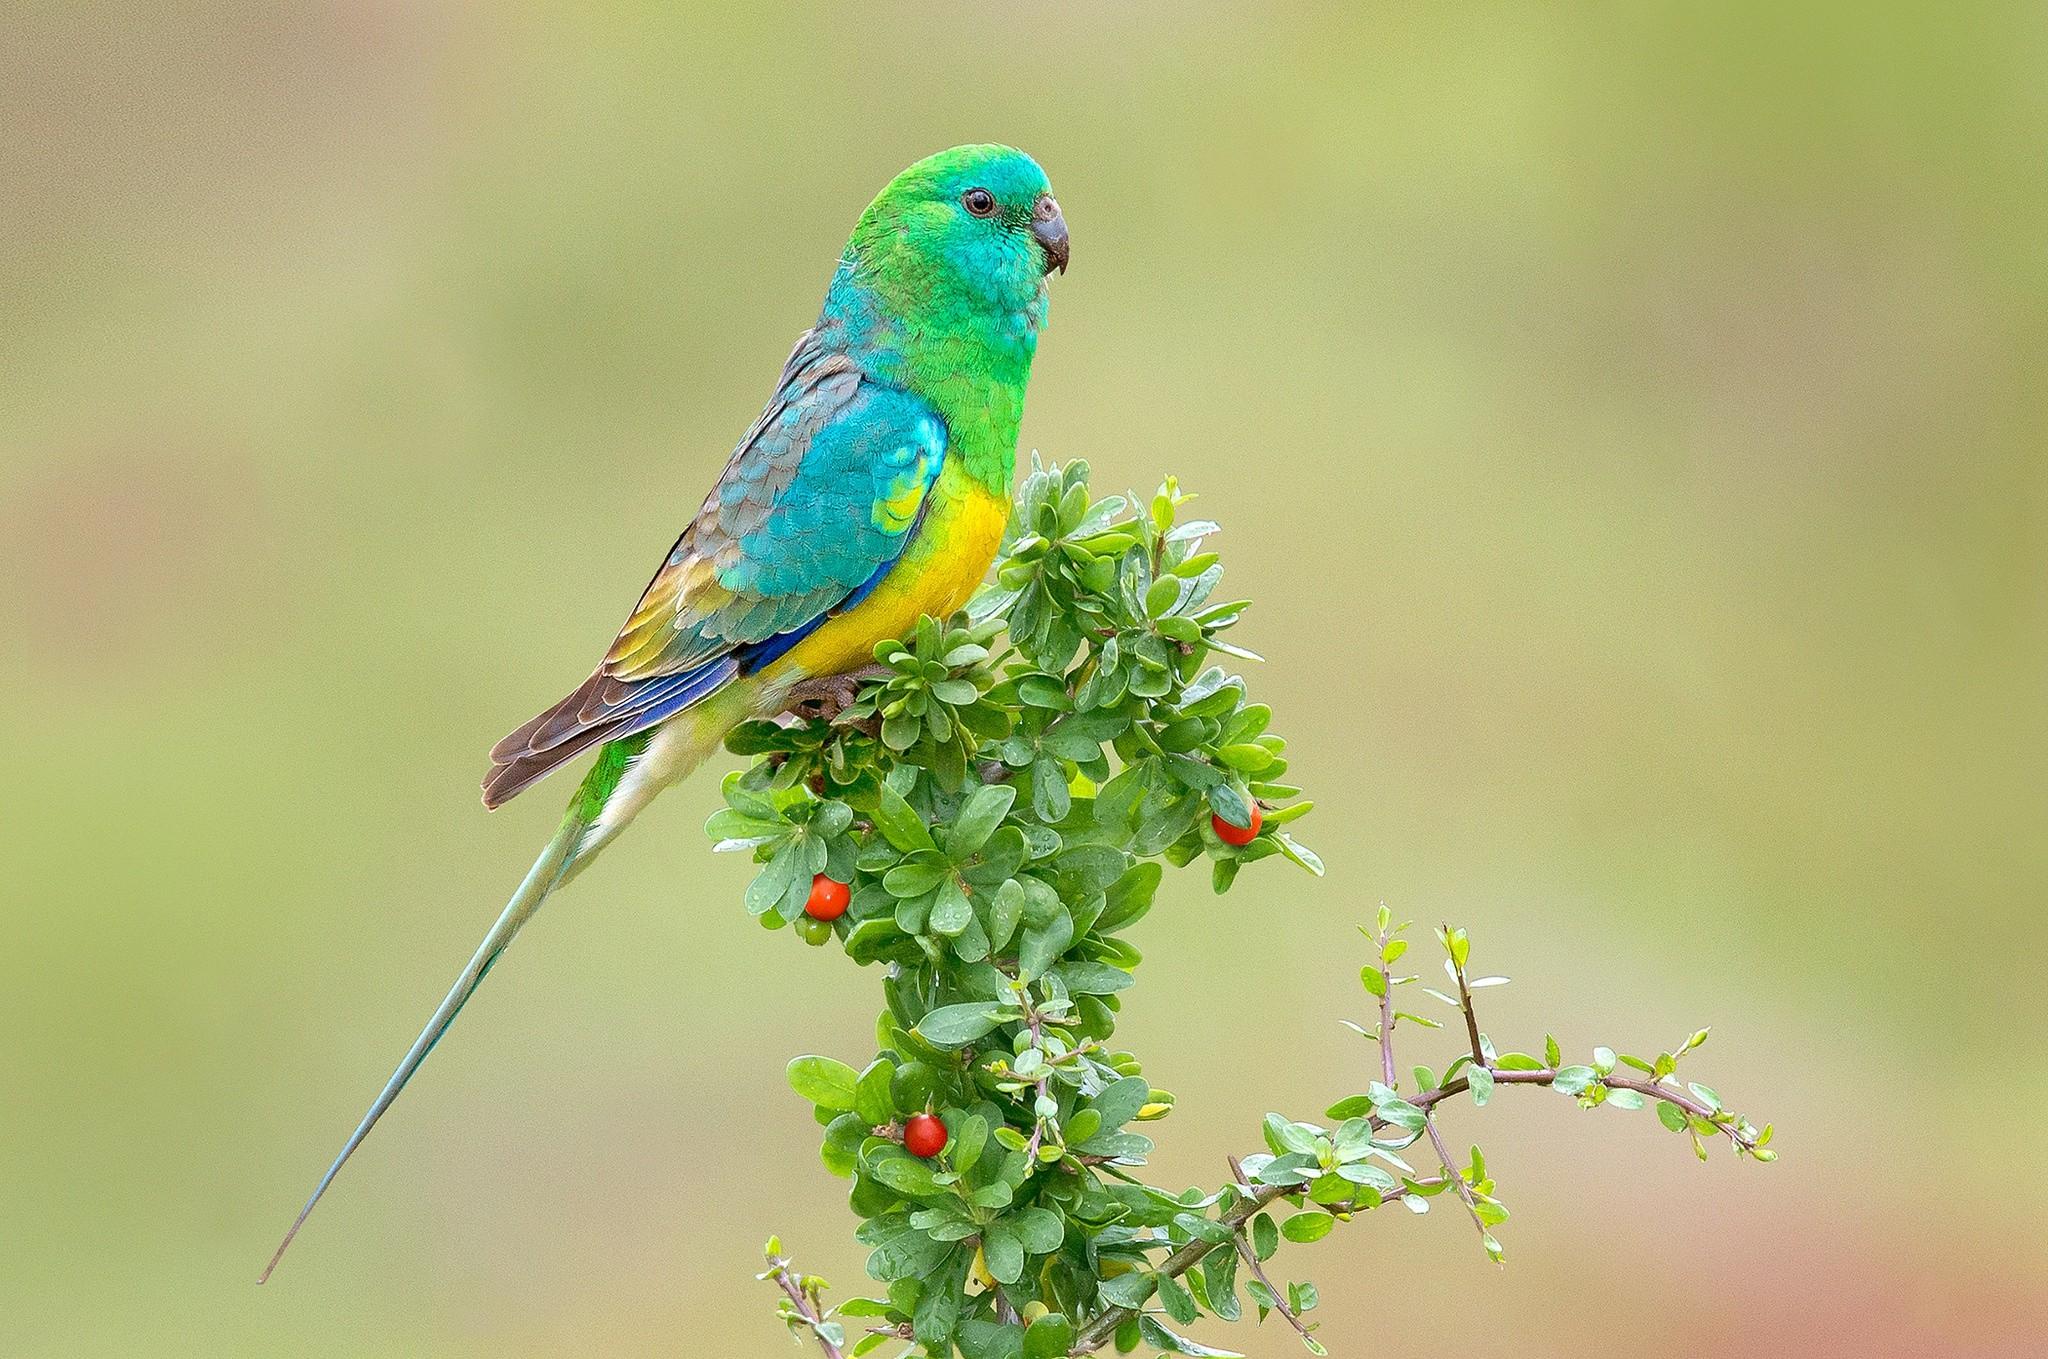 parrot images download